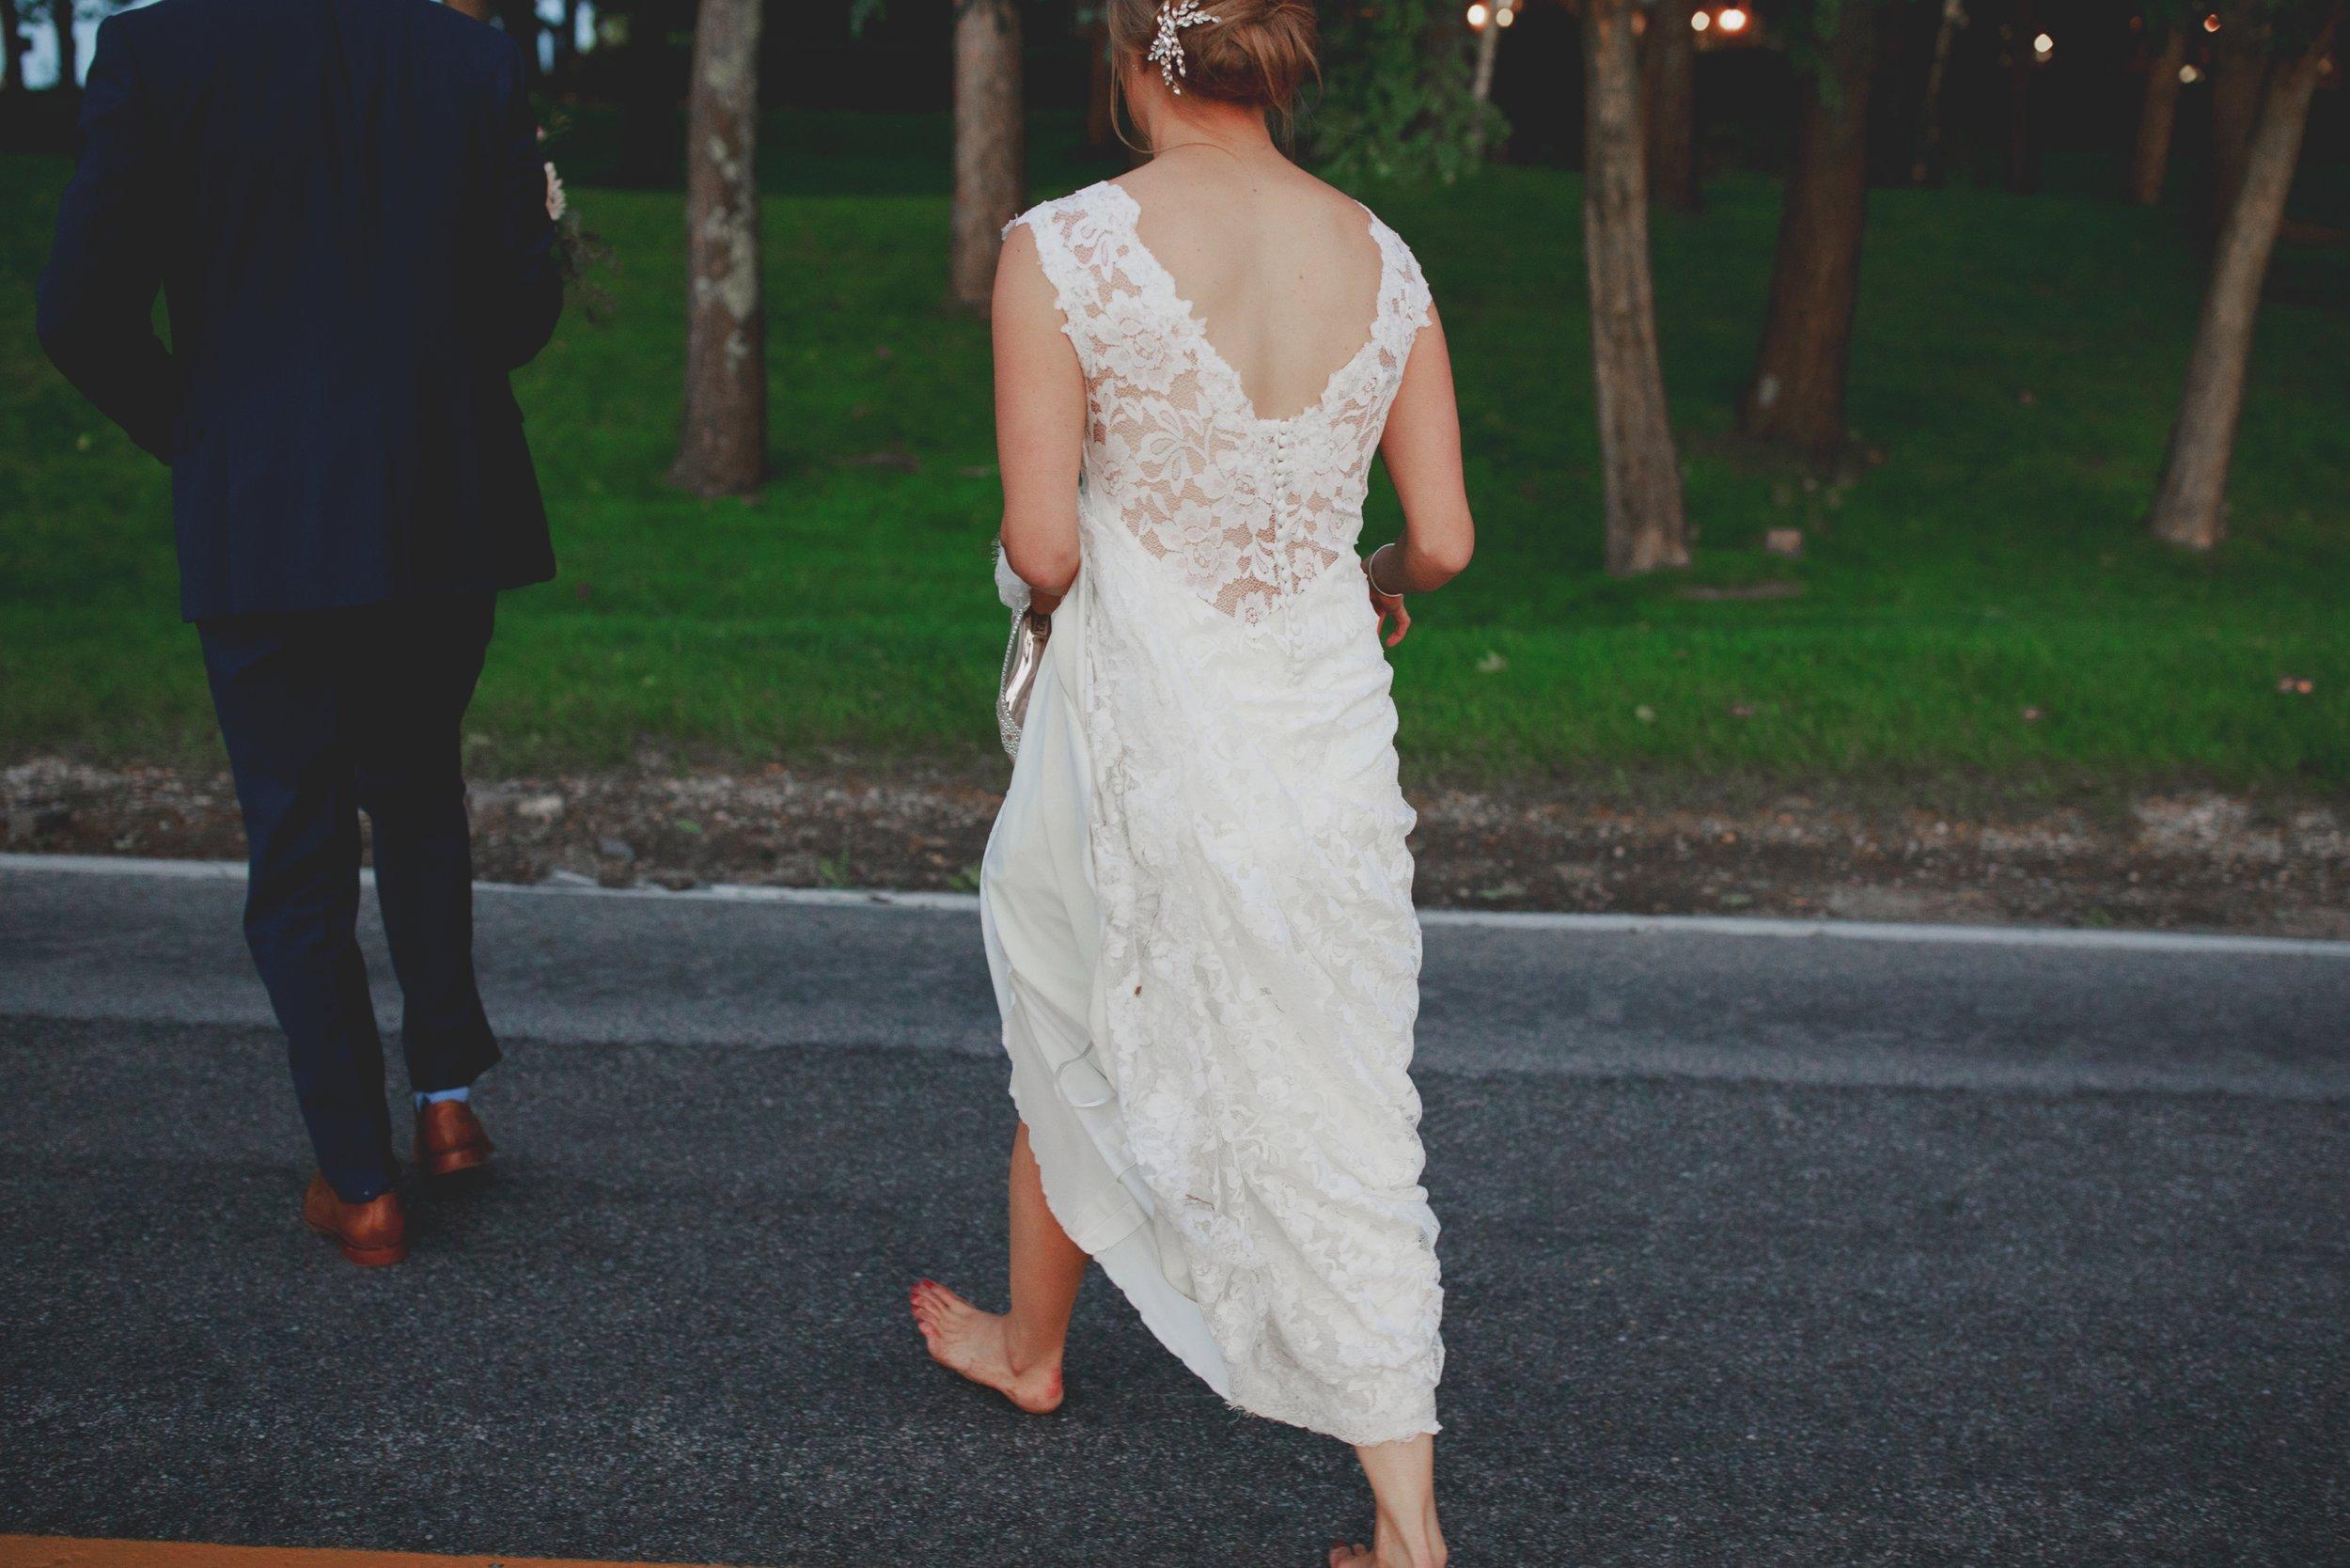 traverse_city_wedding_145.jpg